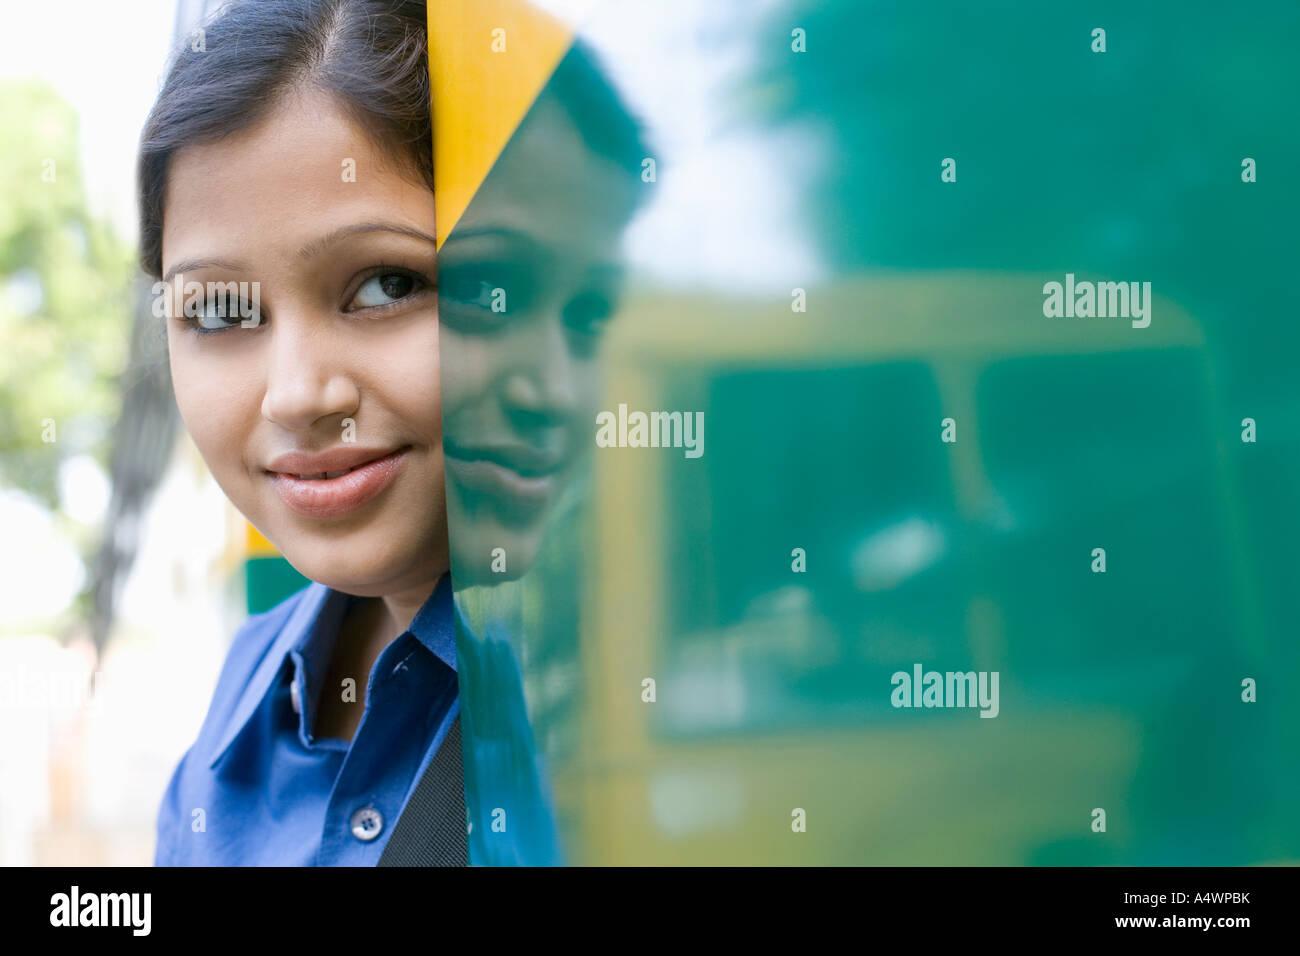 Studentin im Schulbus Tür stehen Stockbild